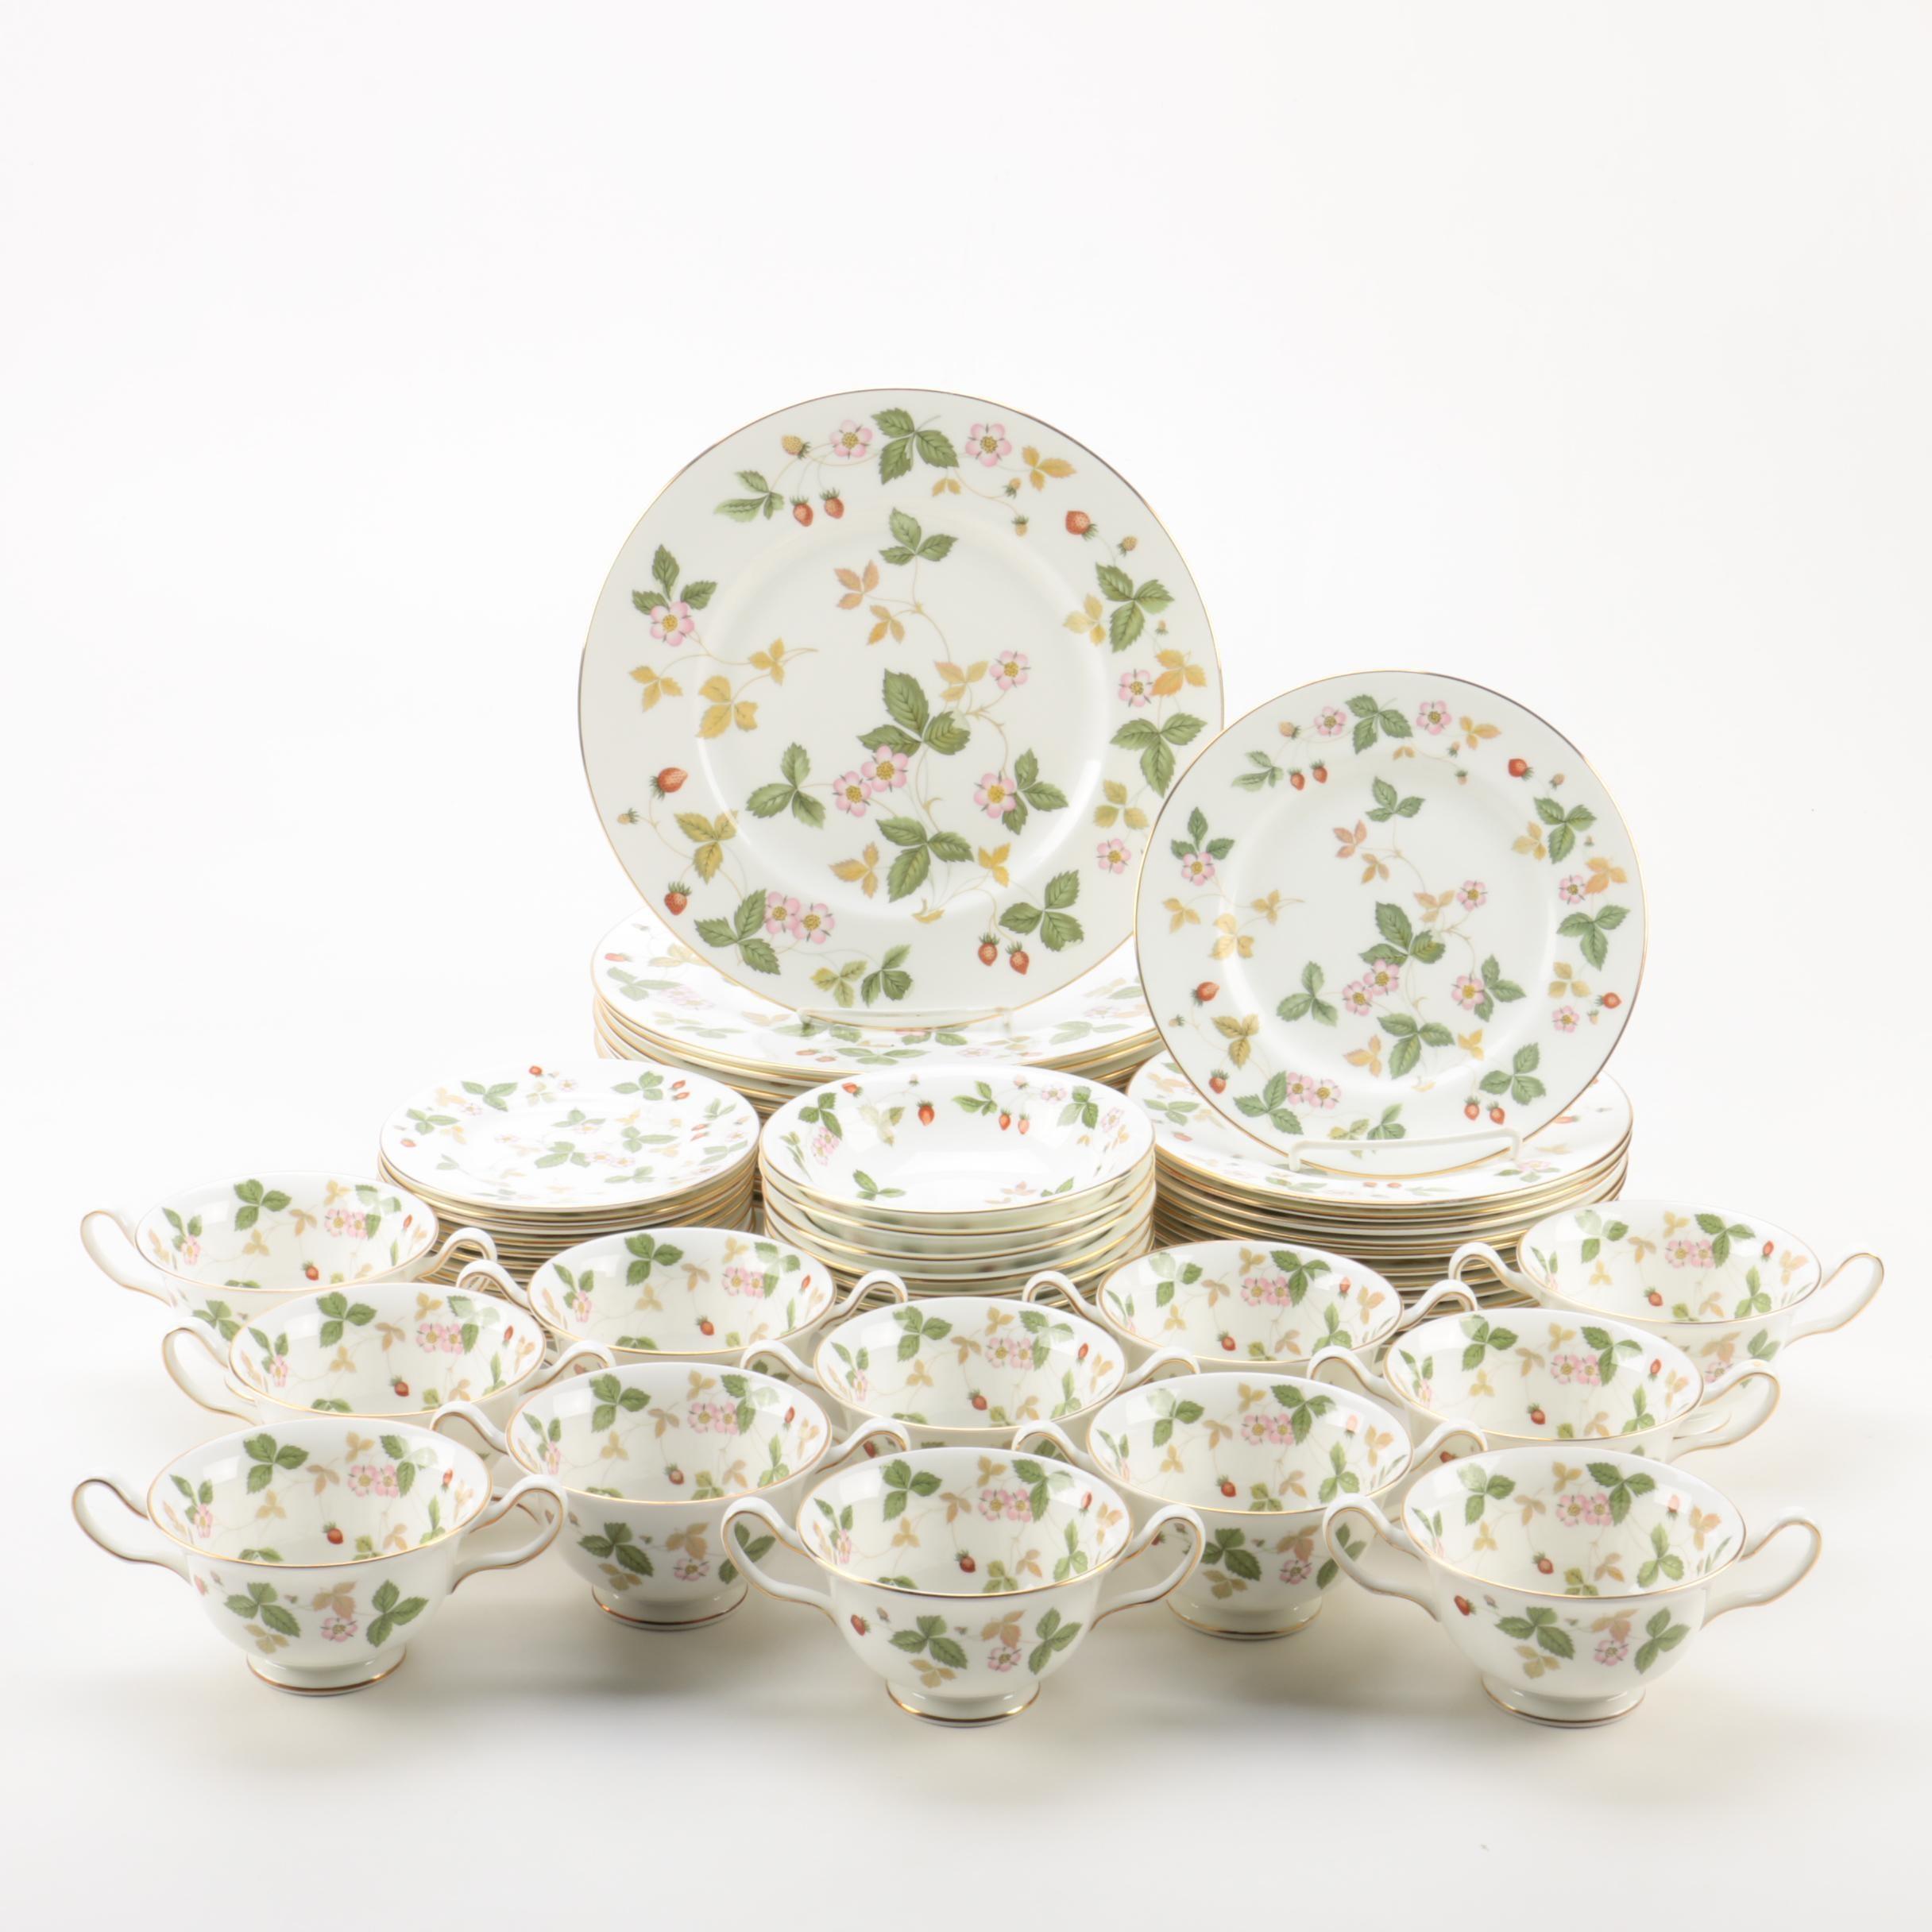 Wedgwood 'Wild Strawberry' Bone China Tableware